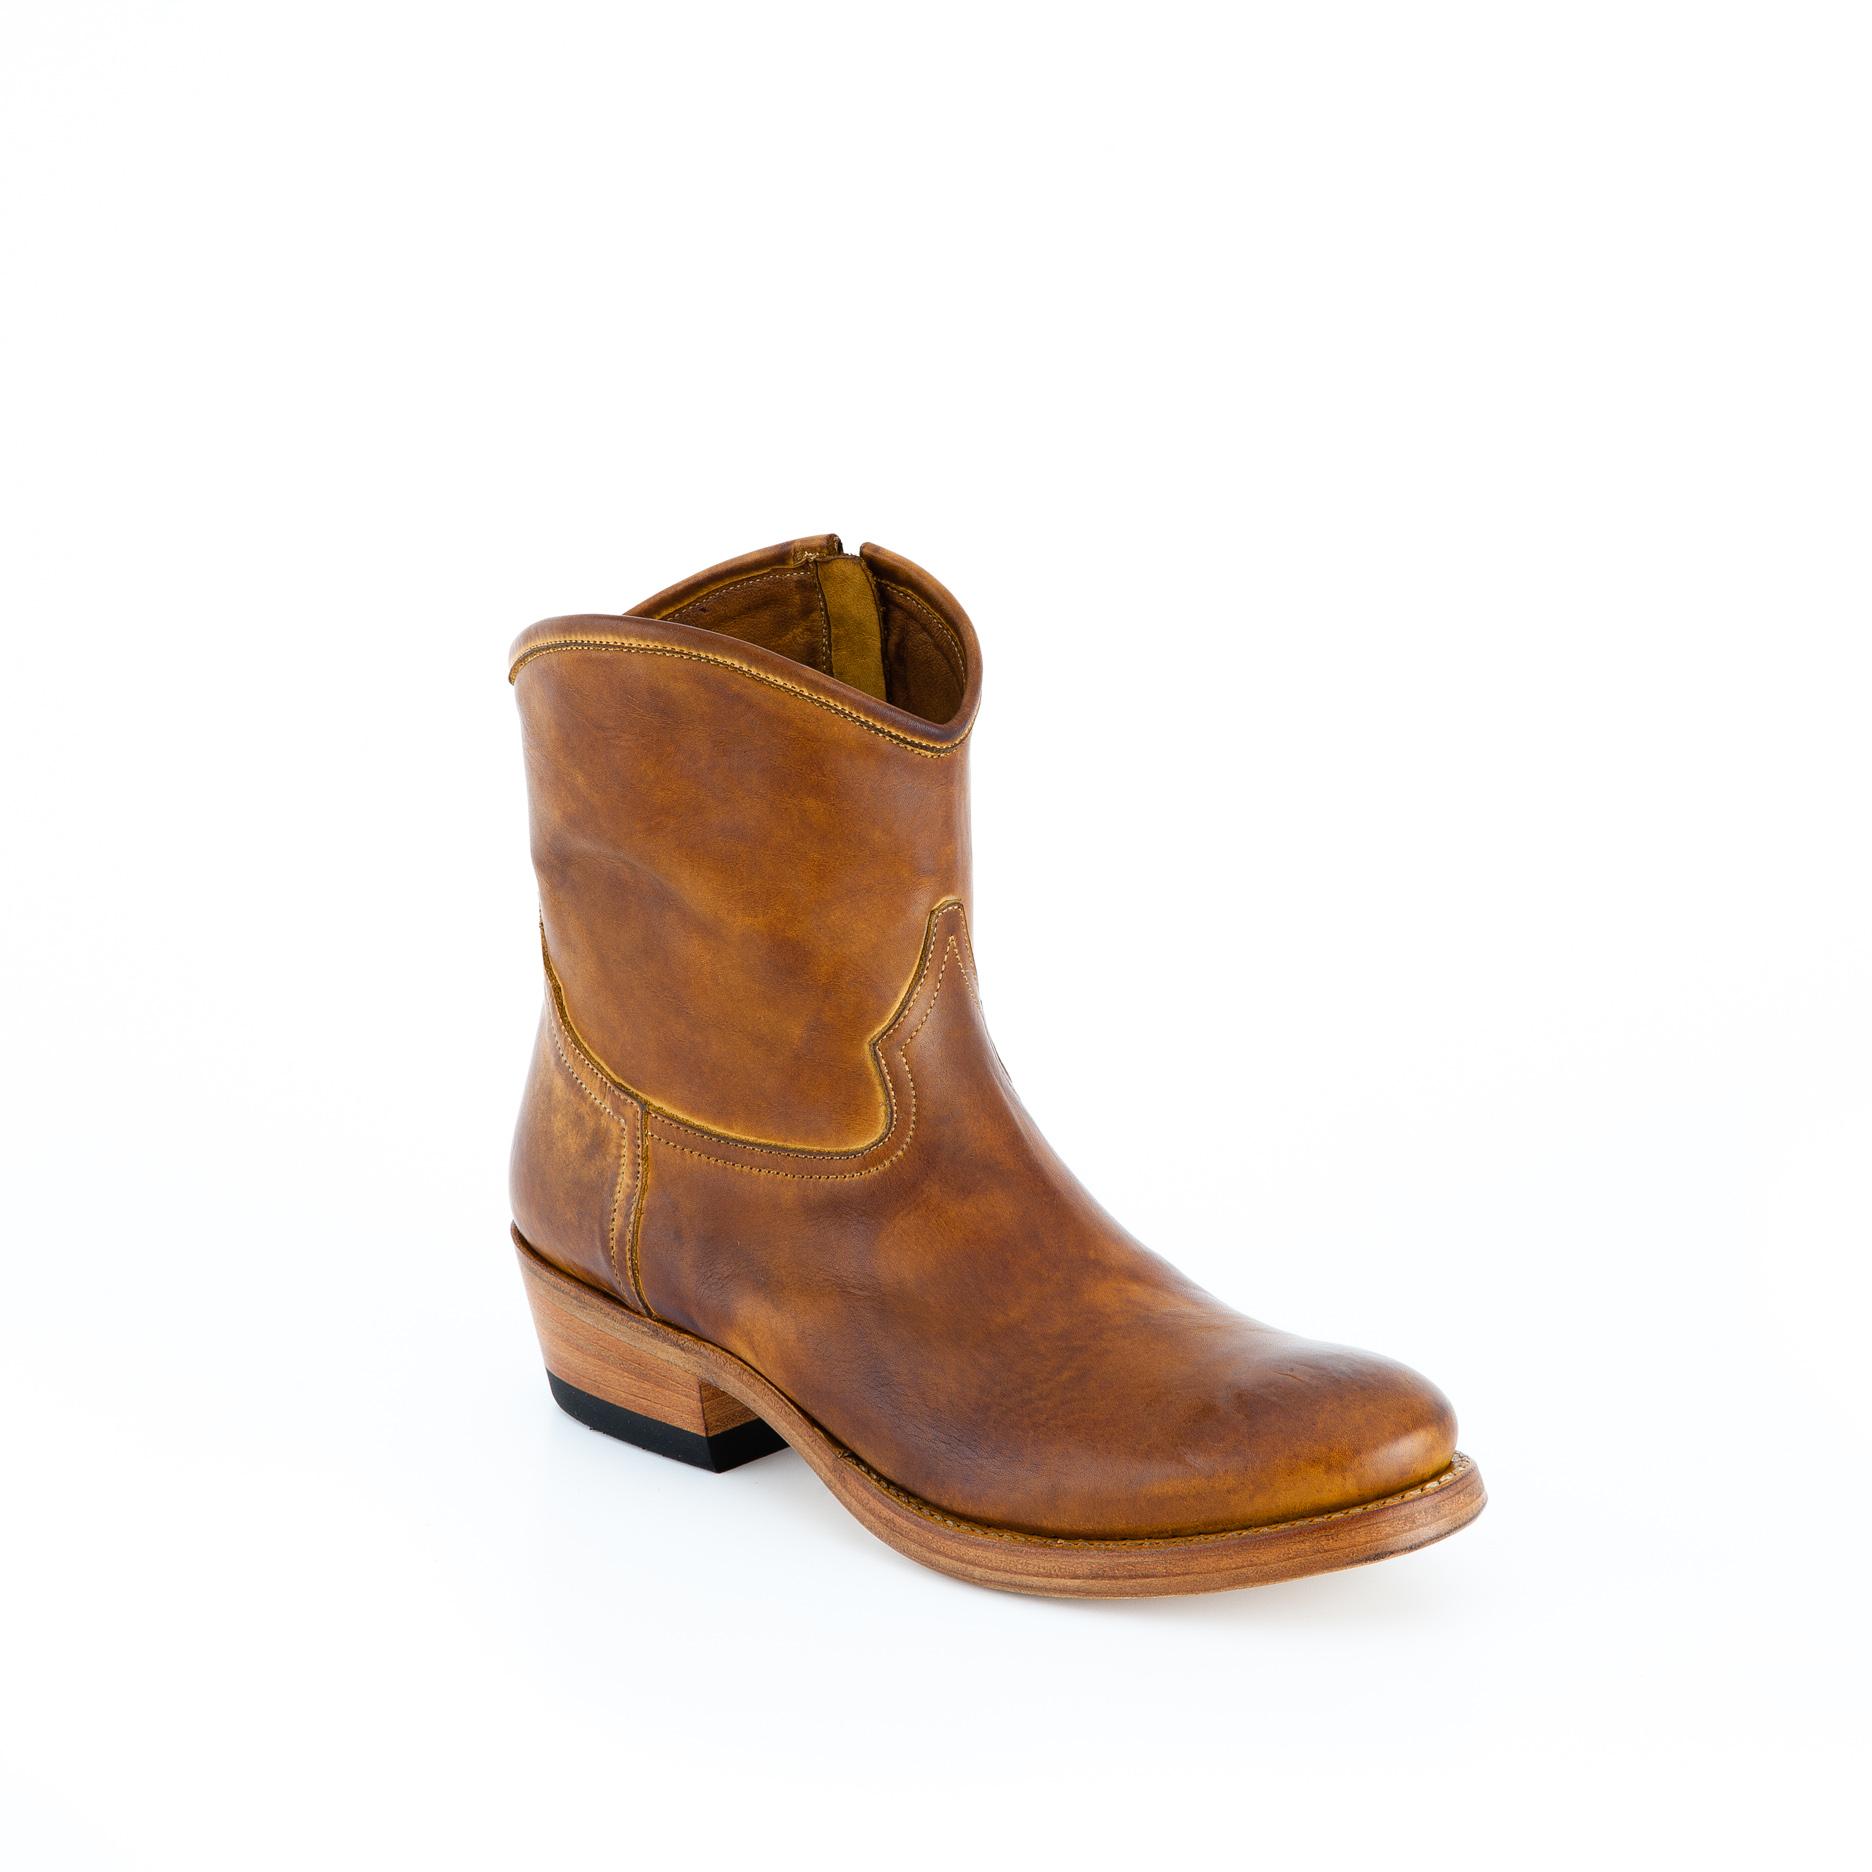 santiags femme sancho boots et sendra bottes cuir femme. Black Bedroom Furniture Sets. Home Design Ideas